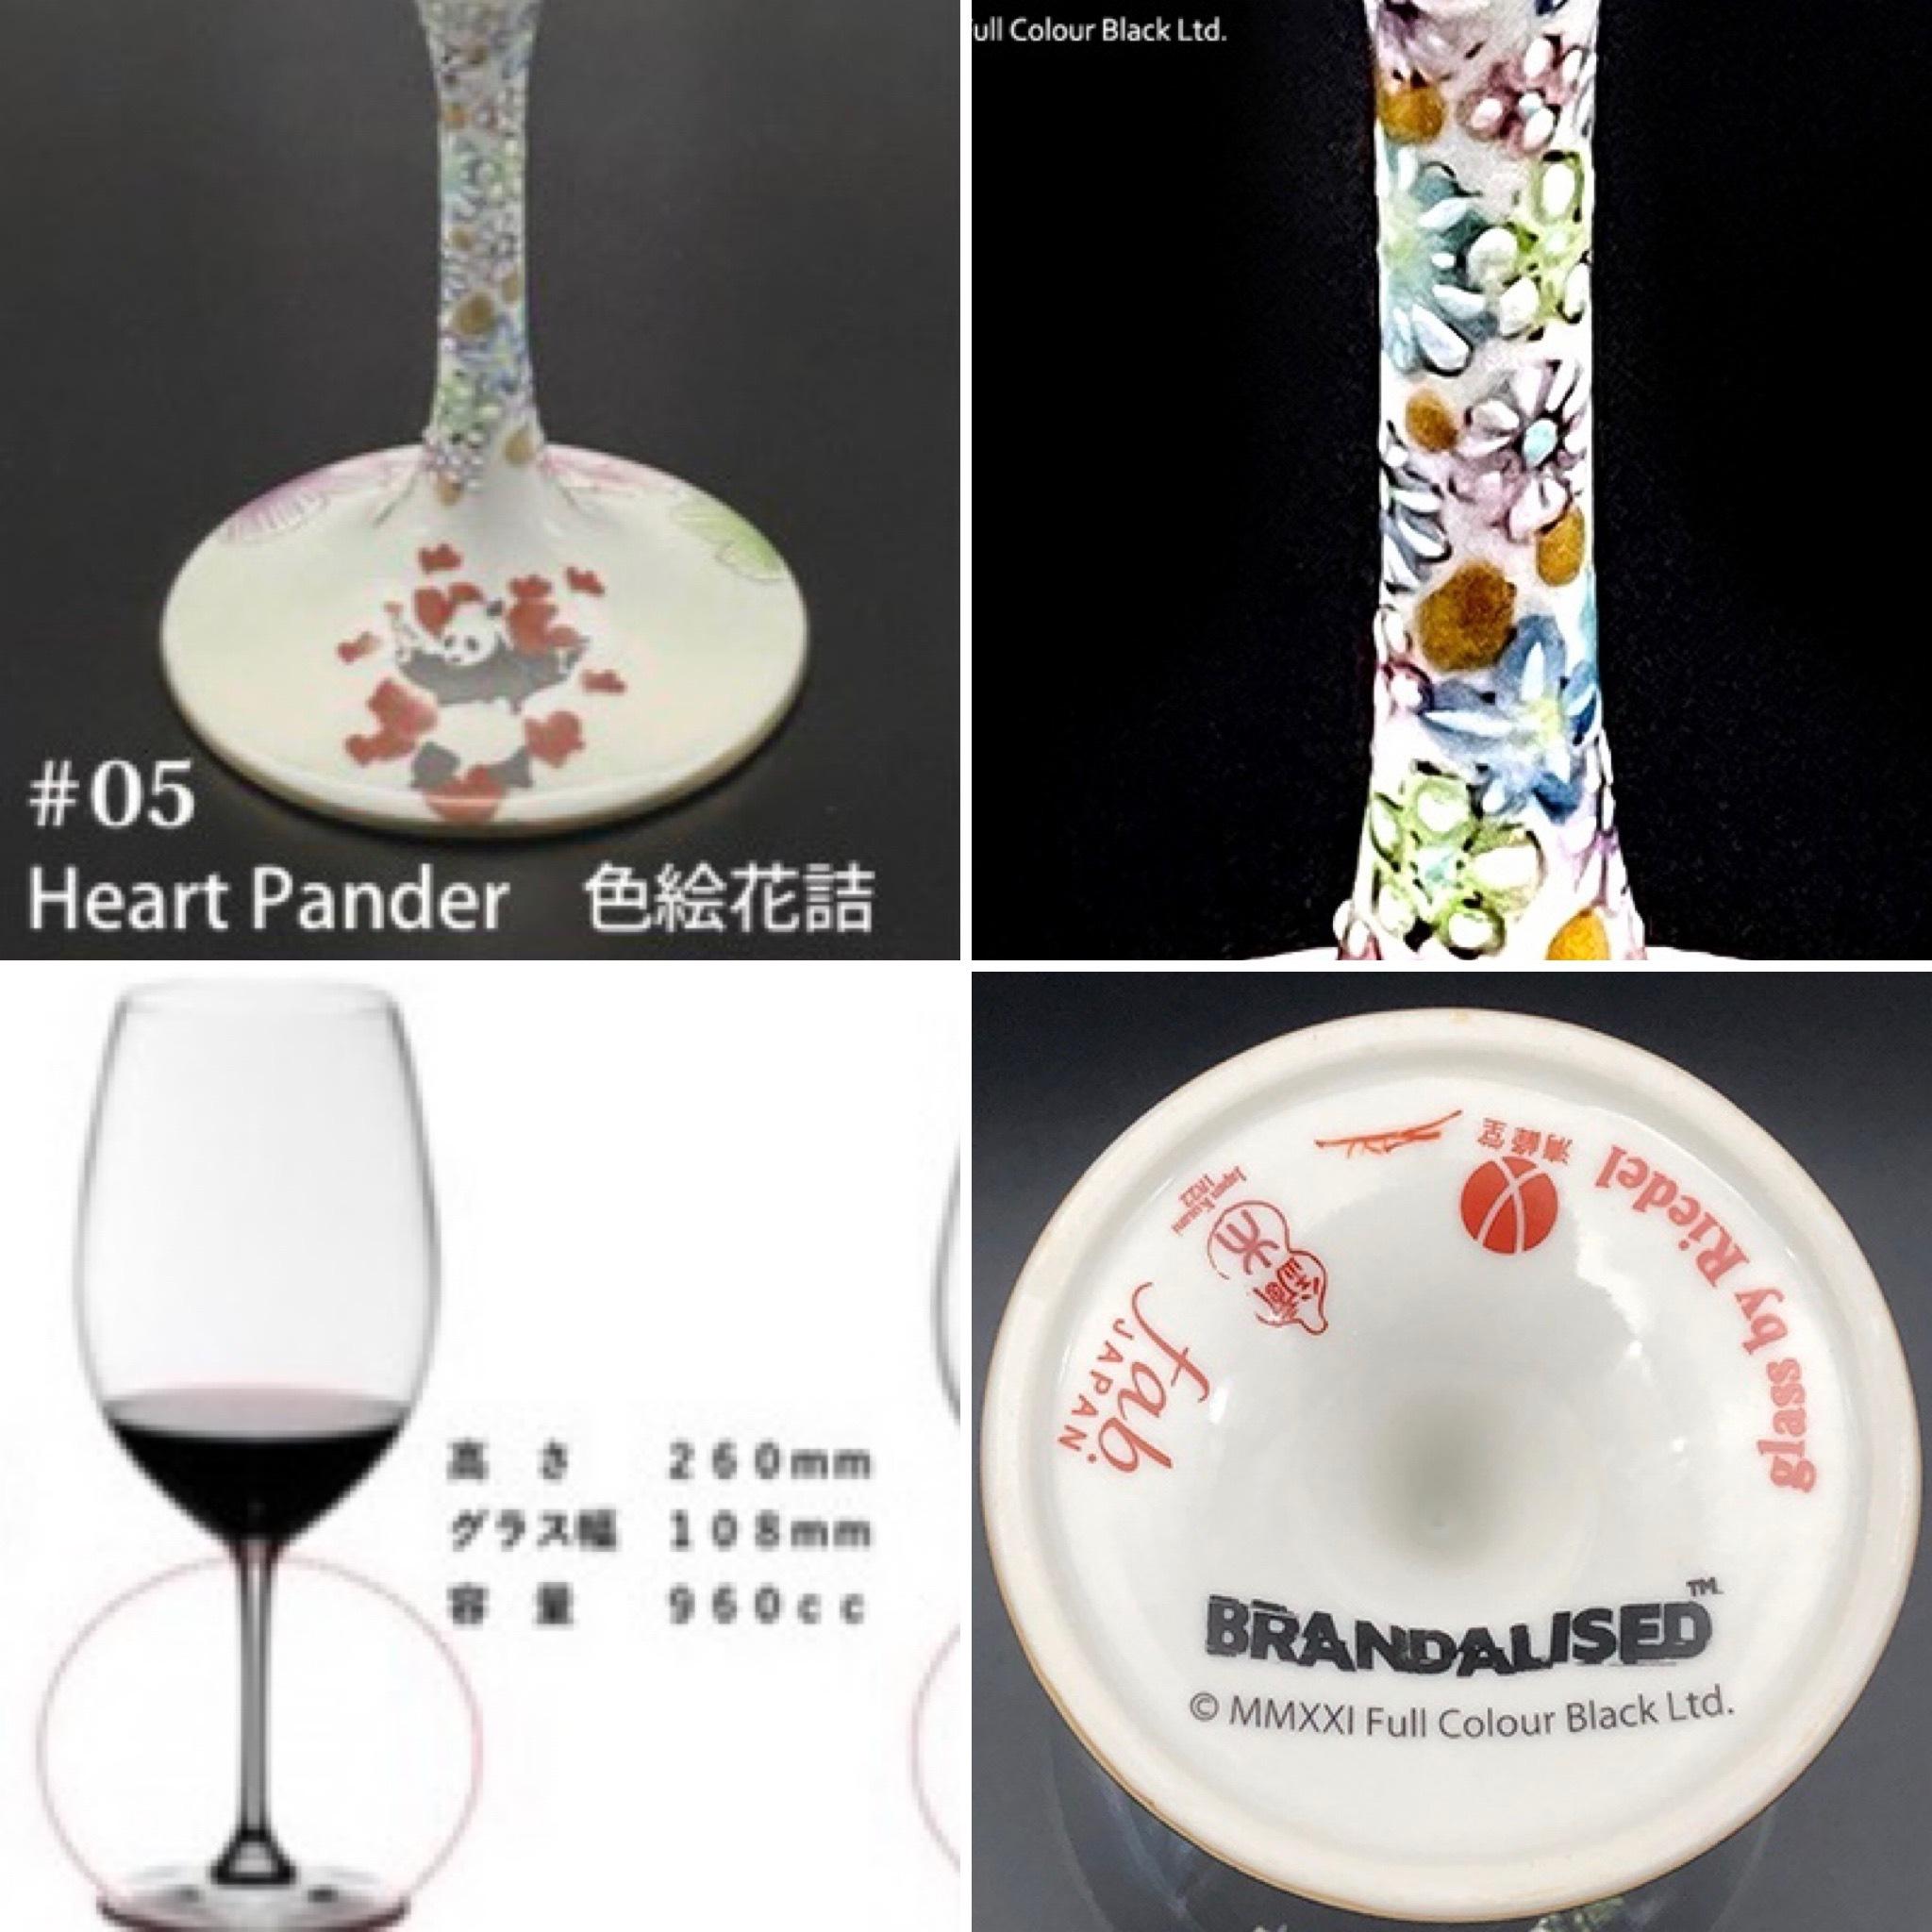 BRANDALISEDグラス / BRANDALISED(バンクシーアート)×鏑木ワイングラス(BBグラス)